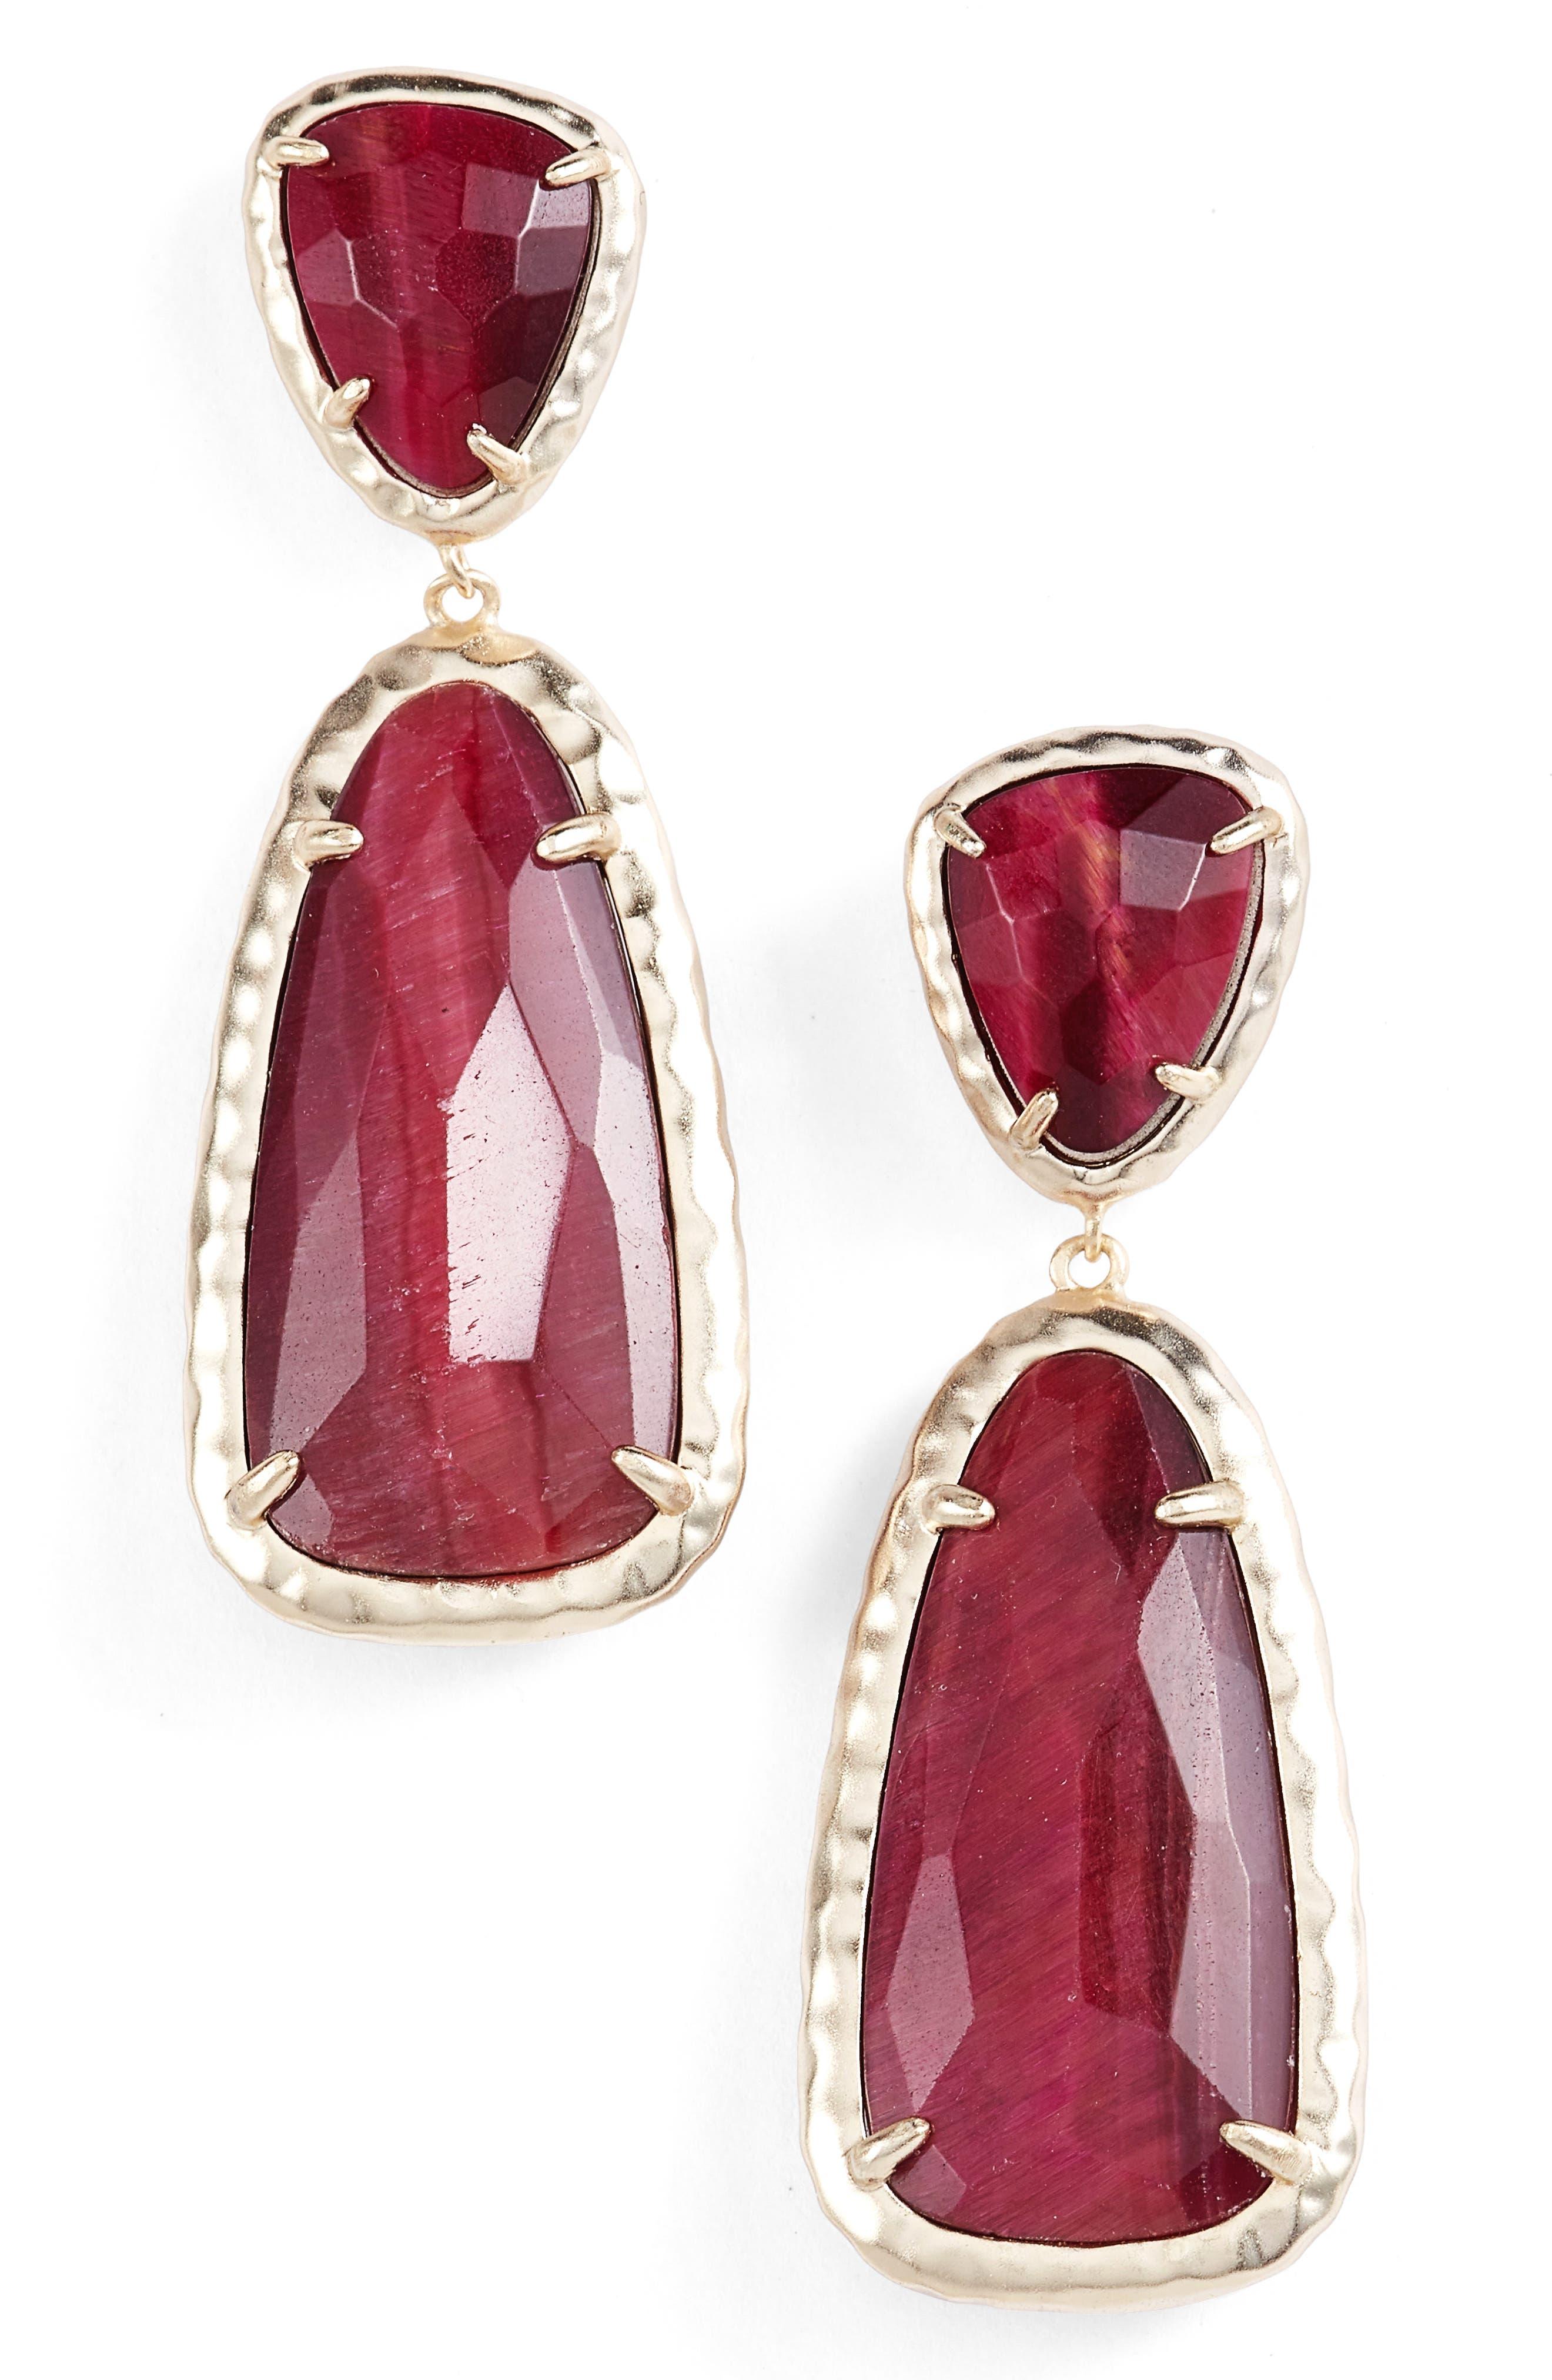 Daria Drop Earrings,                             Main thumbnail 1, color,                             Bordeaux Tiger Eye/ Gold